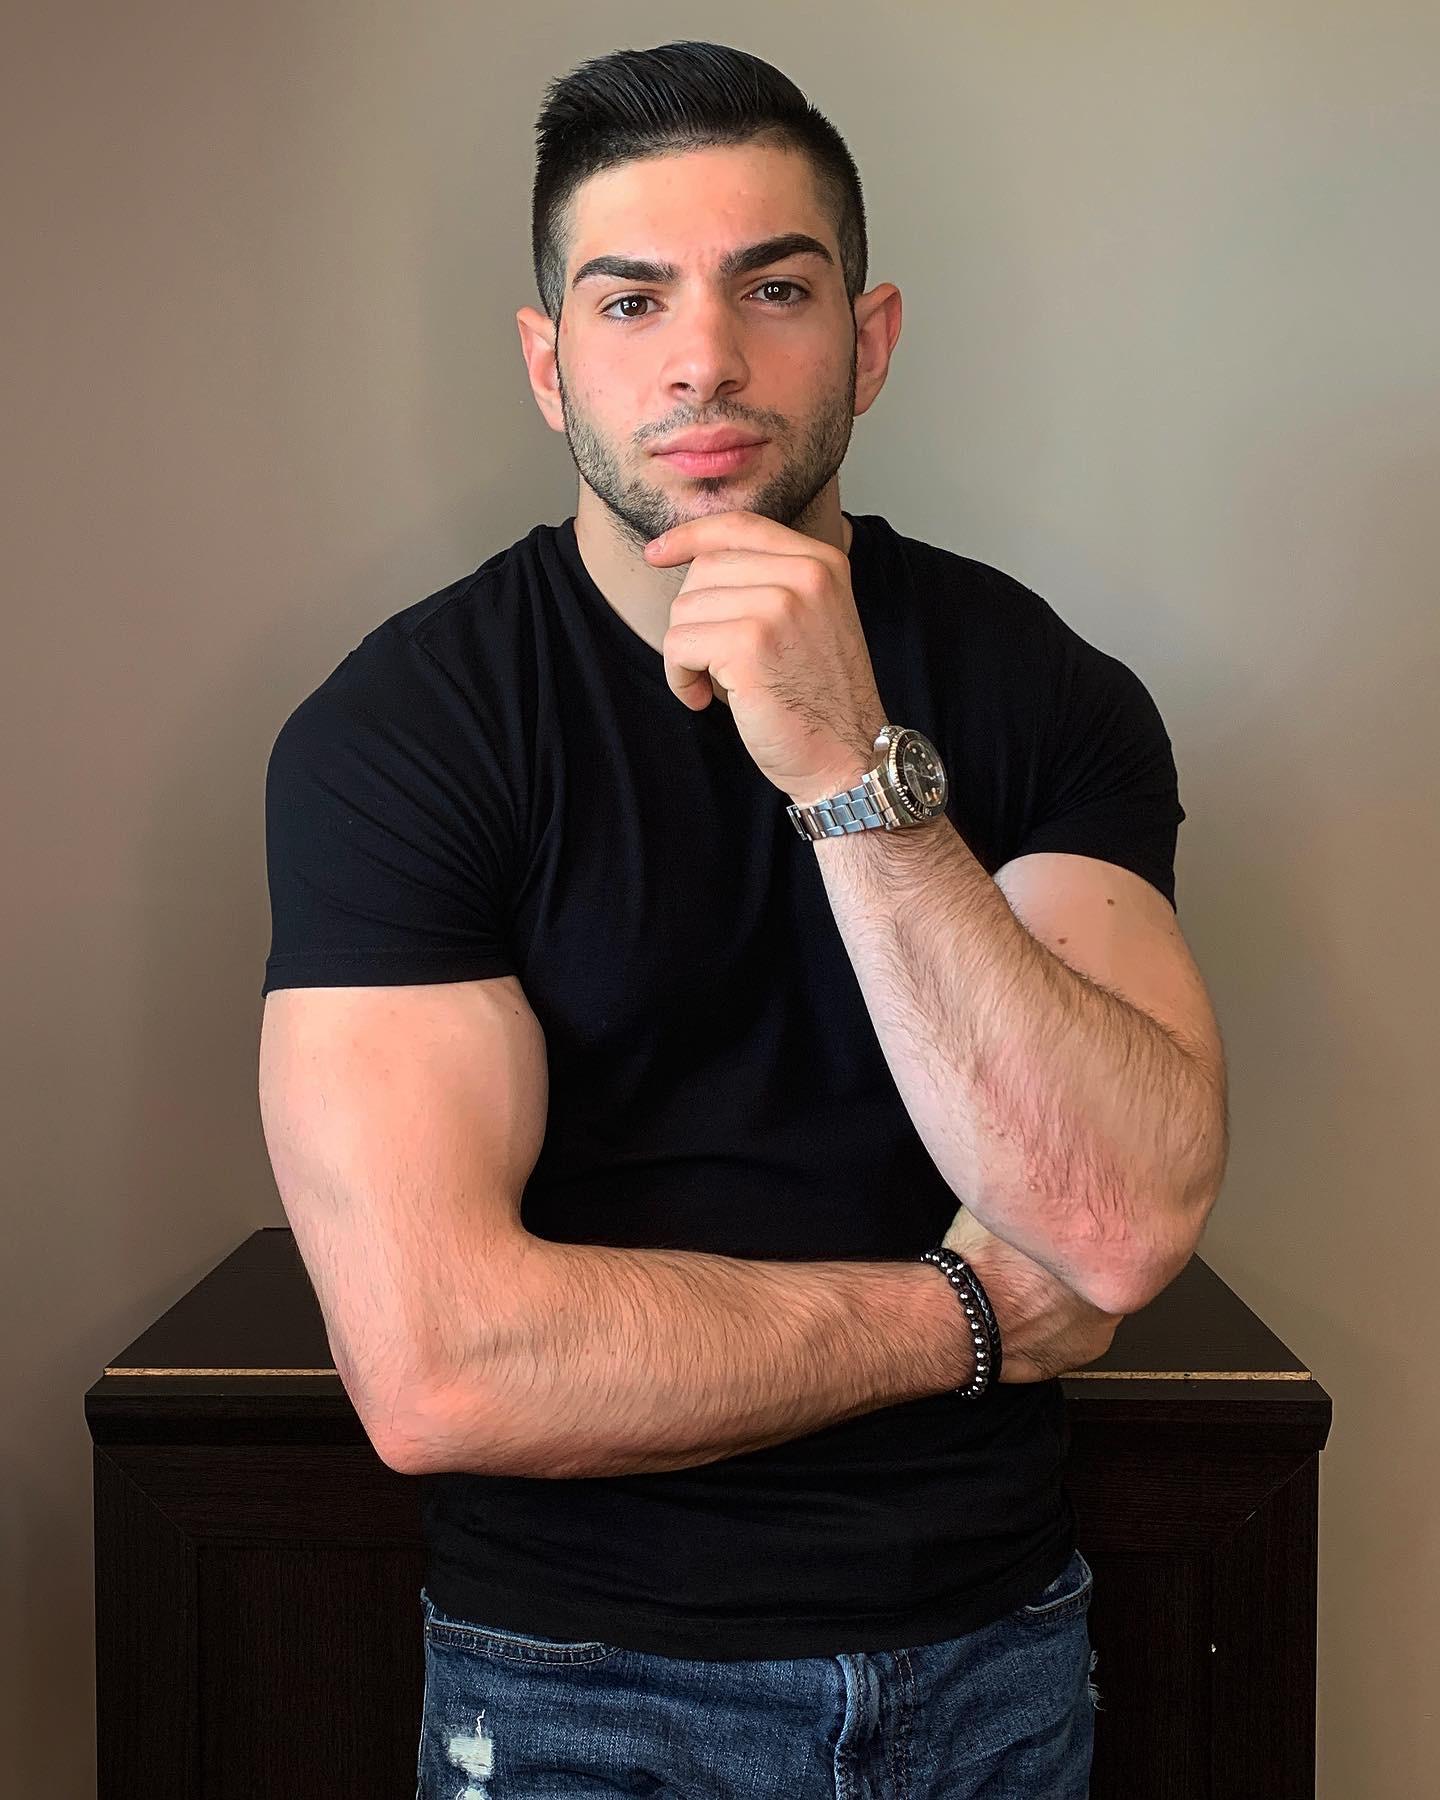 Jason Stavrianidis